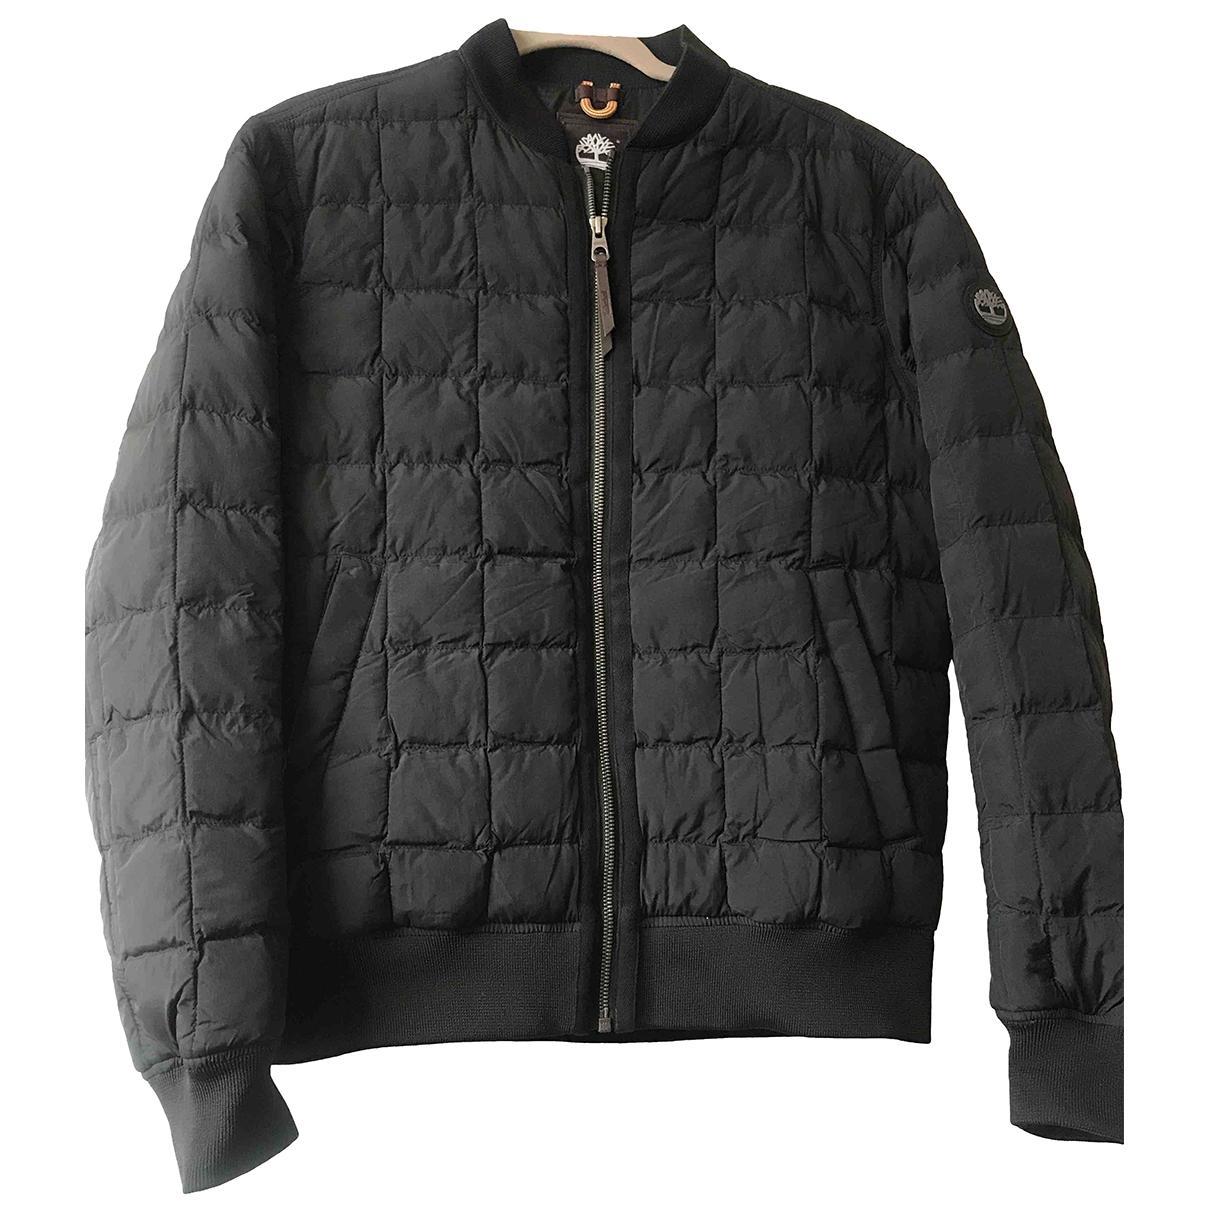 Timberland \N Black jacket  for Men S International